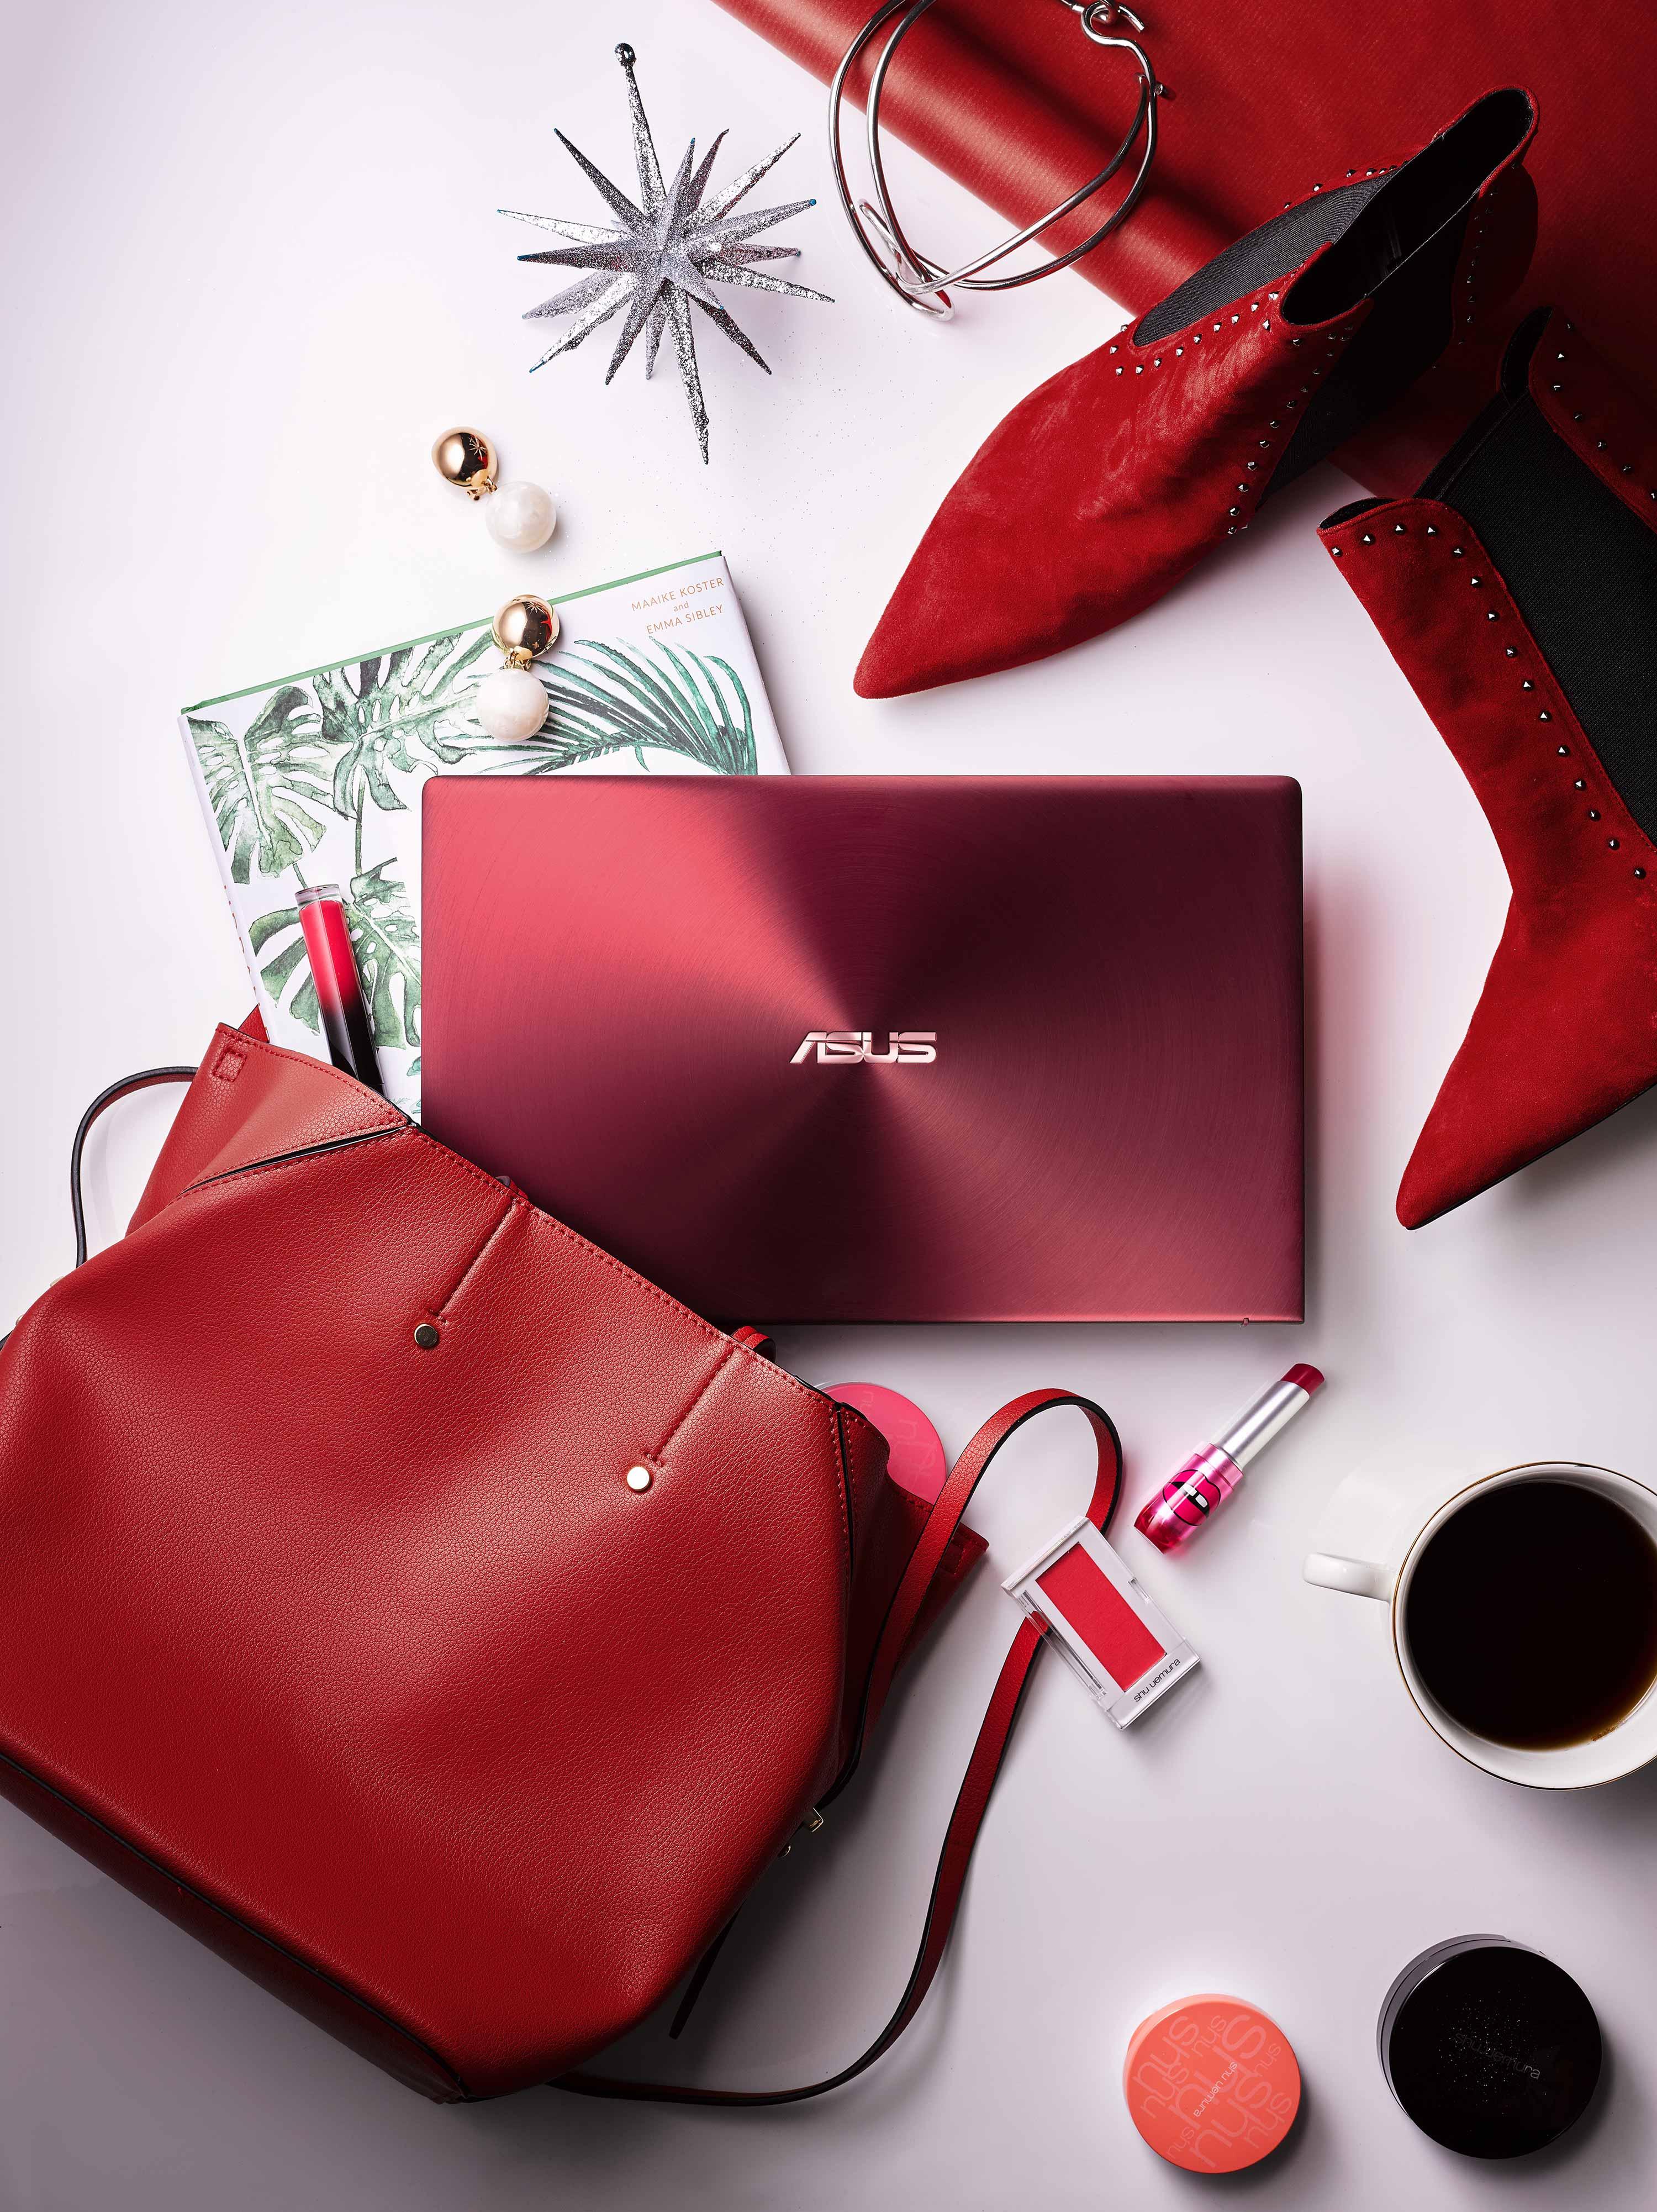 ASUS ZenBook 13勃艮第紅新色即日起上市,讓消費者擁有更多送禮選擇。